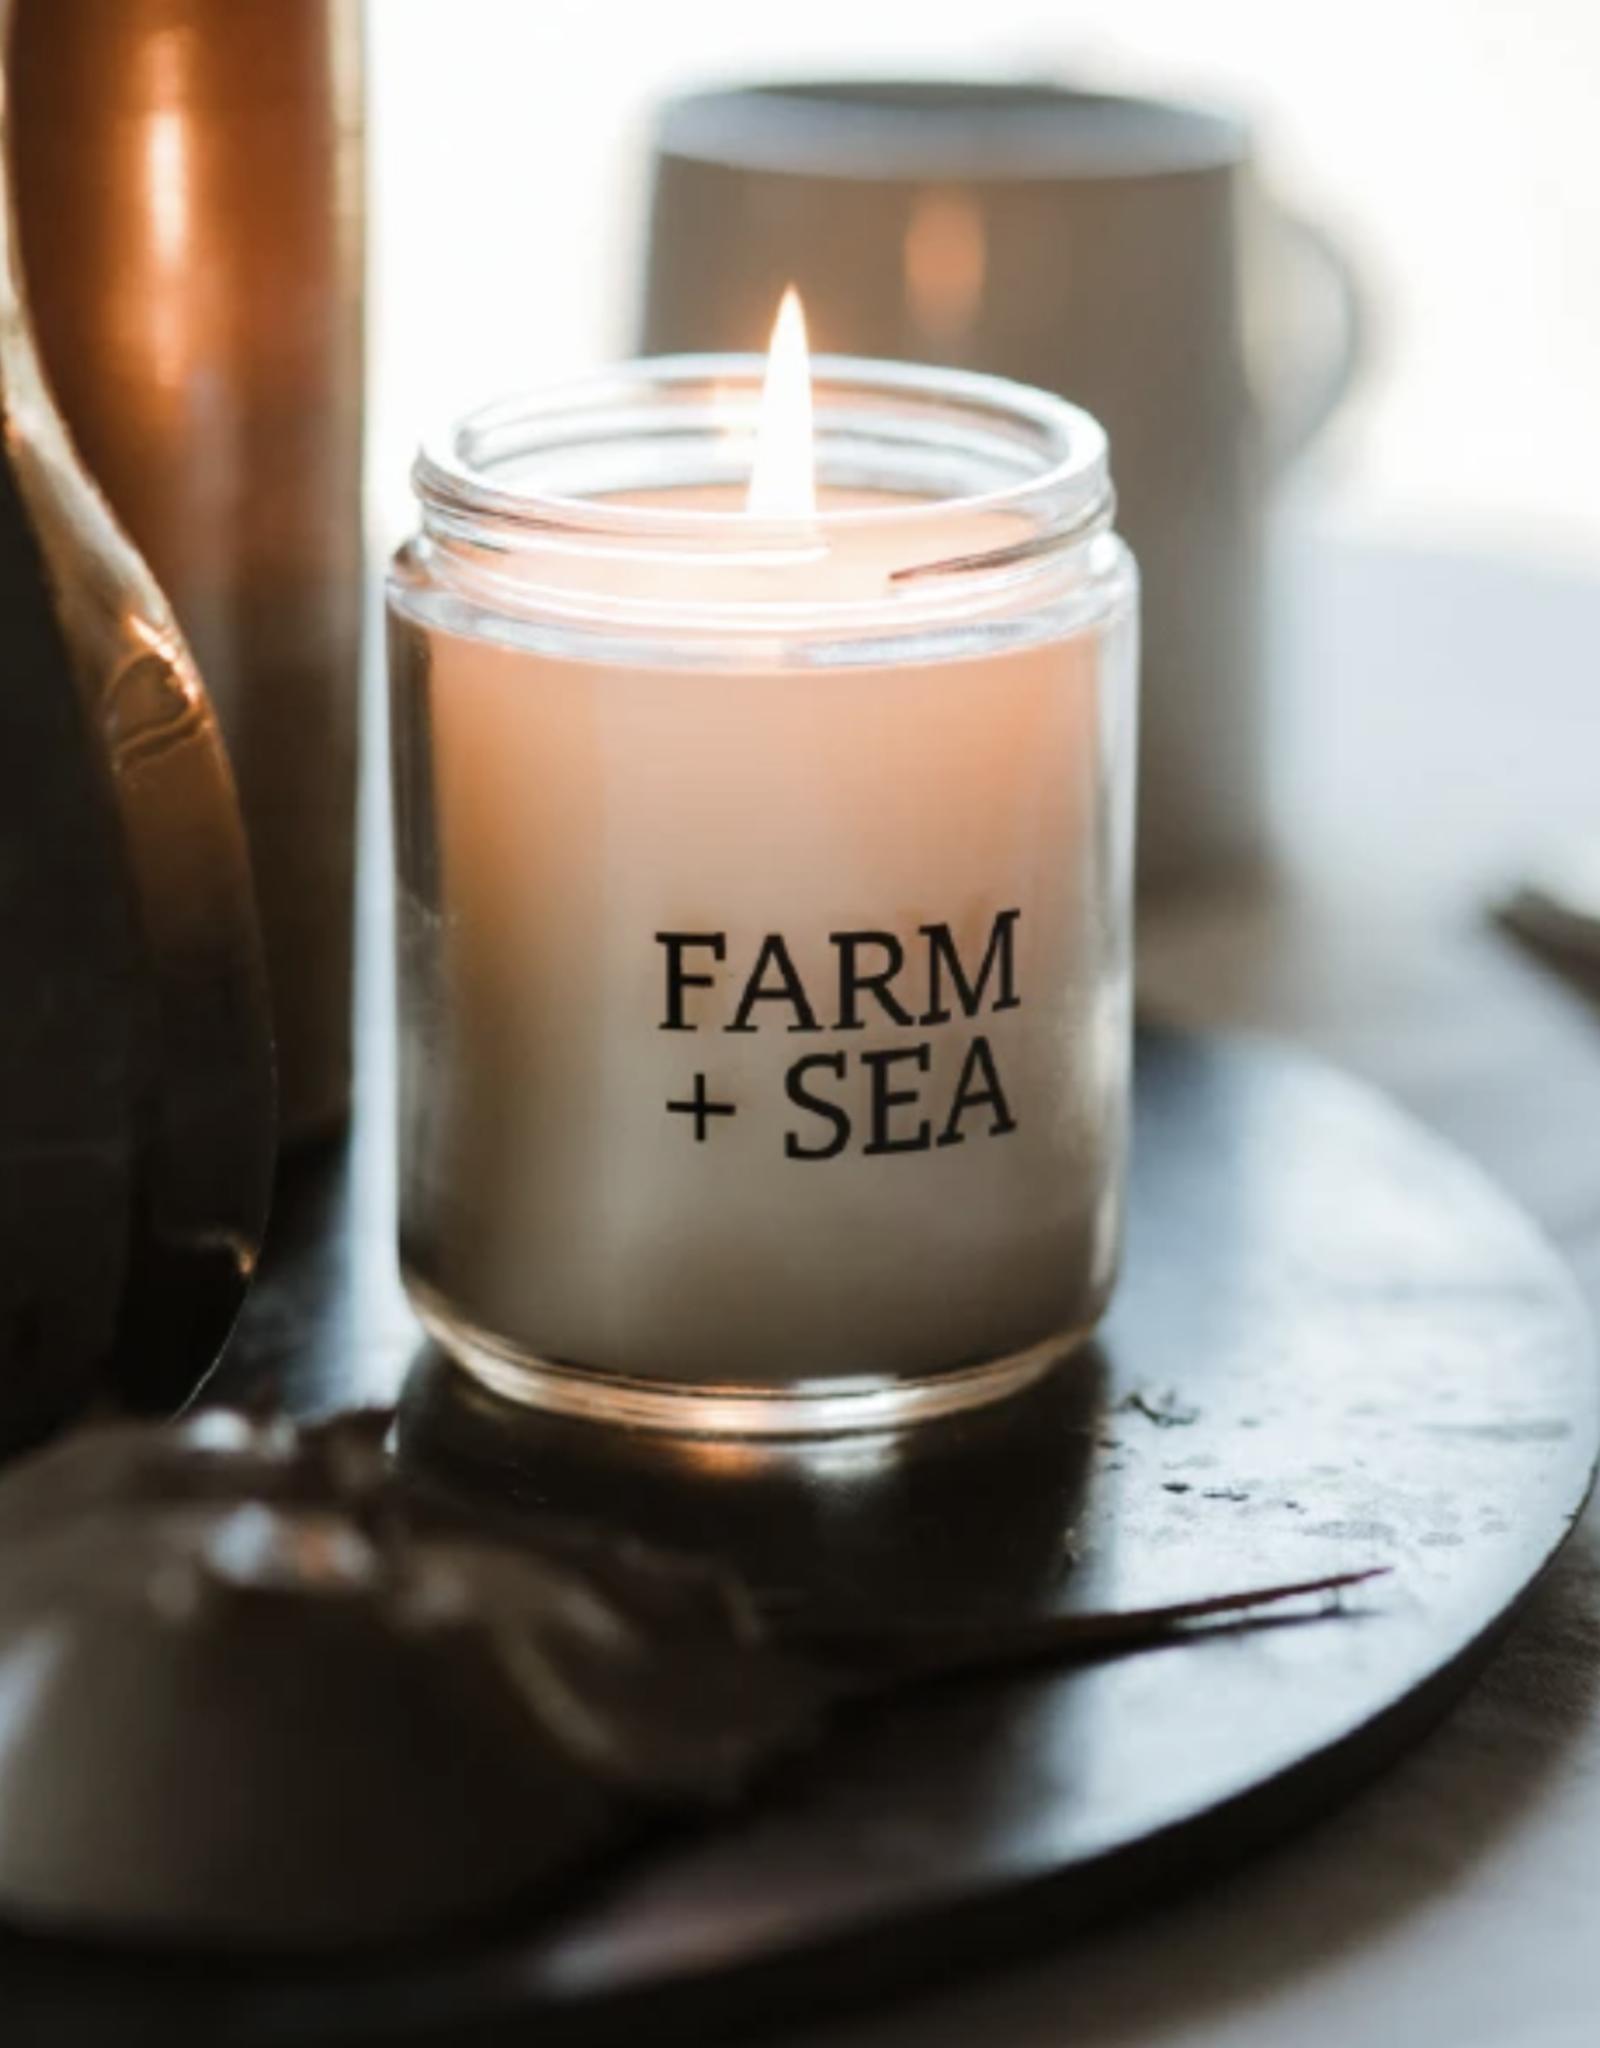 Farm + Sea Farm + Sea - 7.5 oz. Candle Jar - Lemon + Lavender